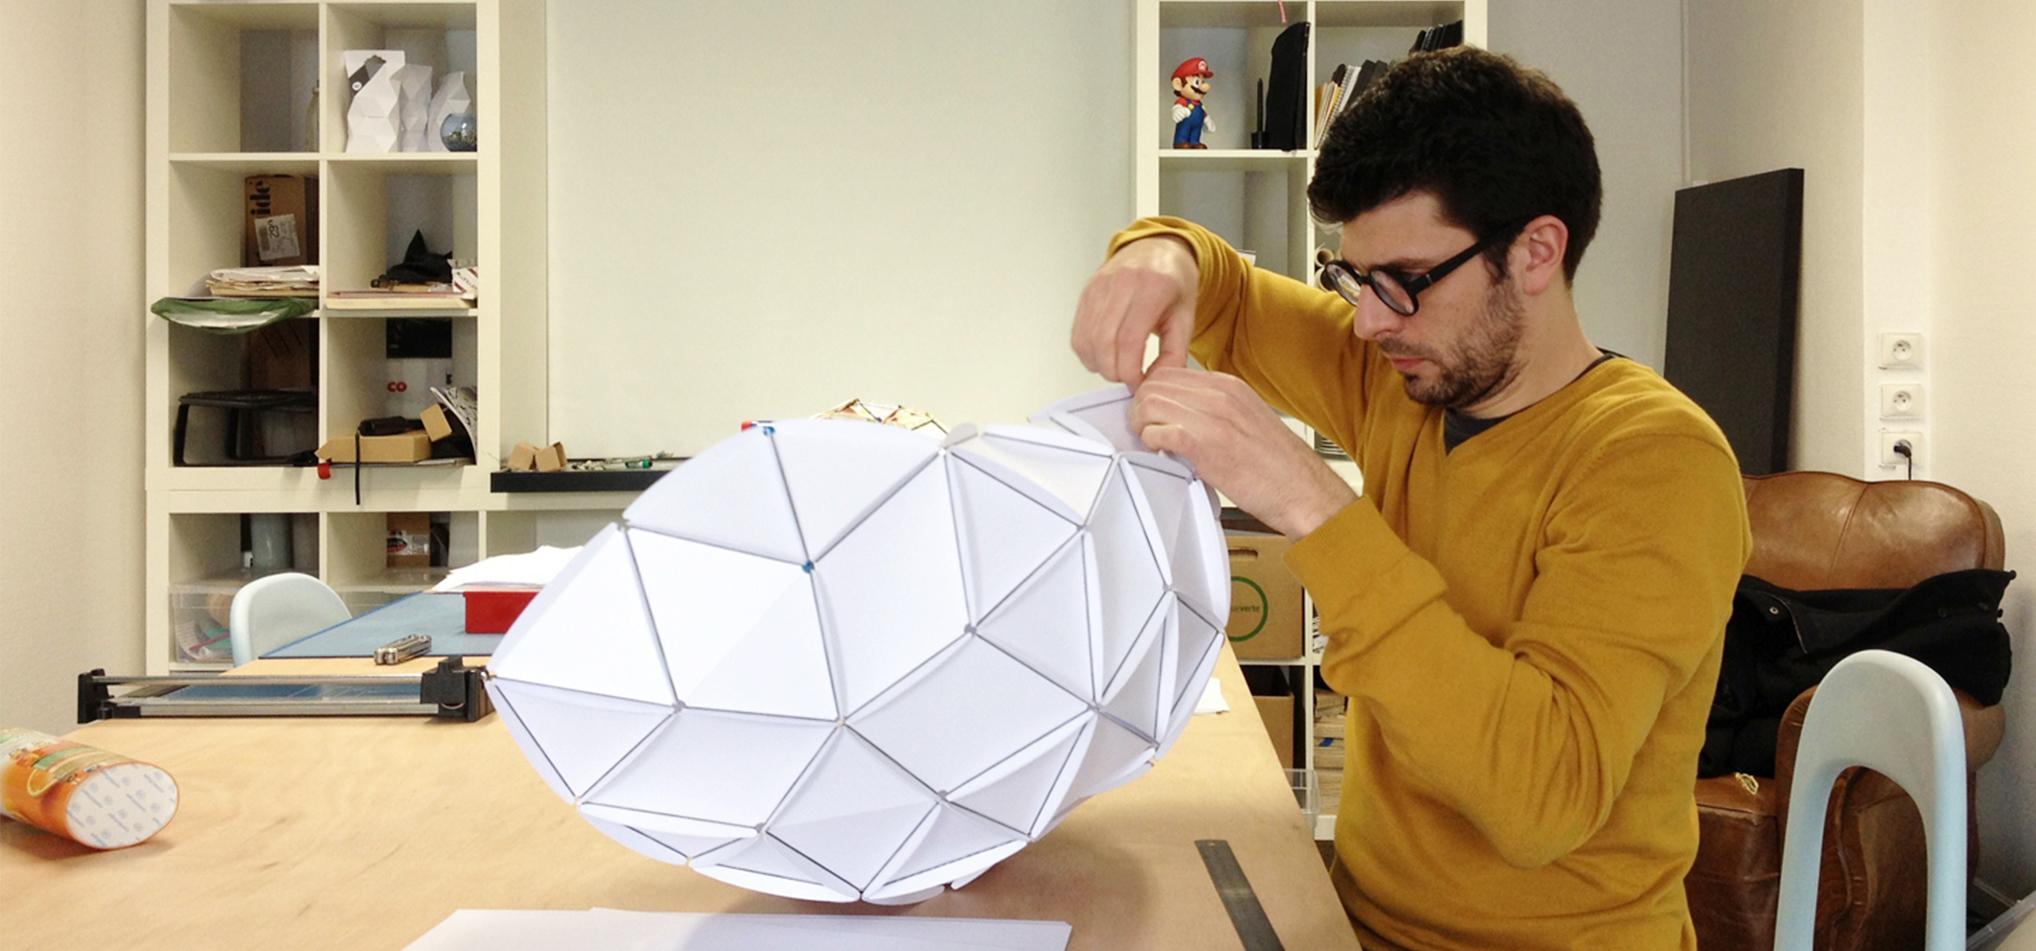 unistudio_merci_lampe_recyclee_design_prototypage_01